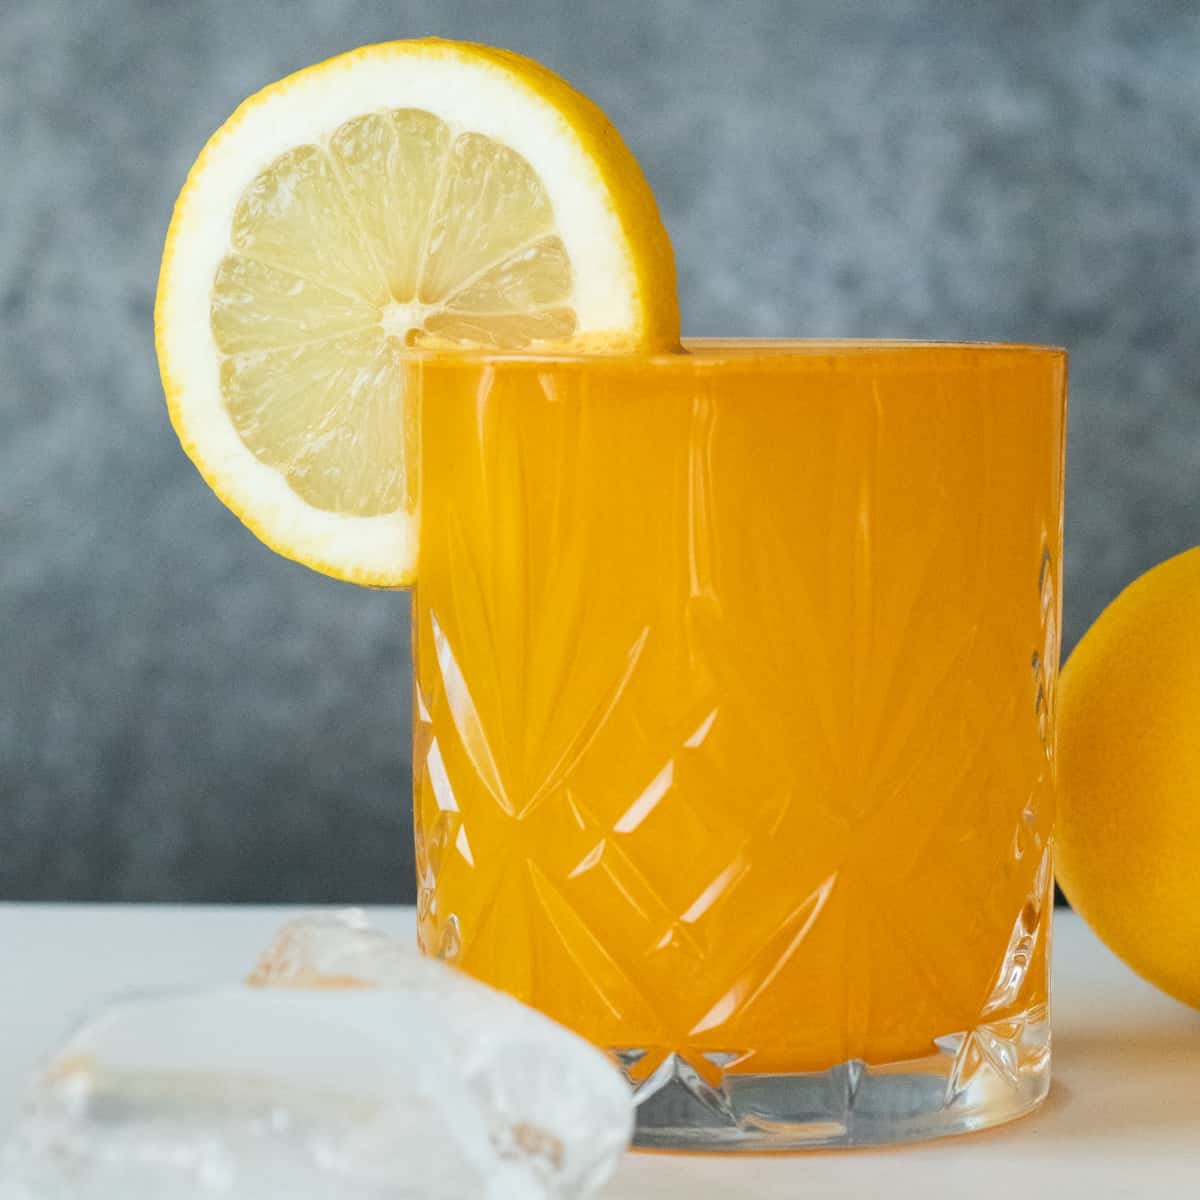 apple cider vinegar tonic decorated with a lemon slice